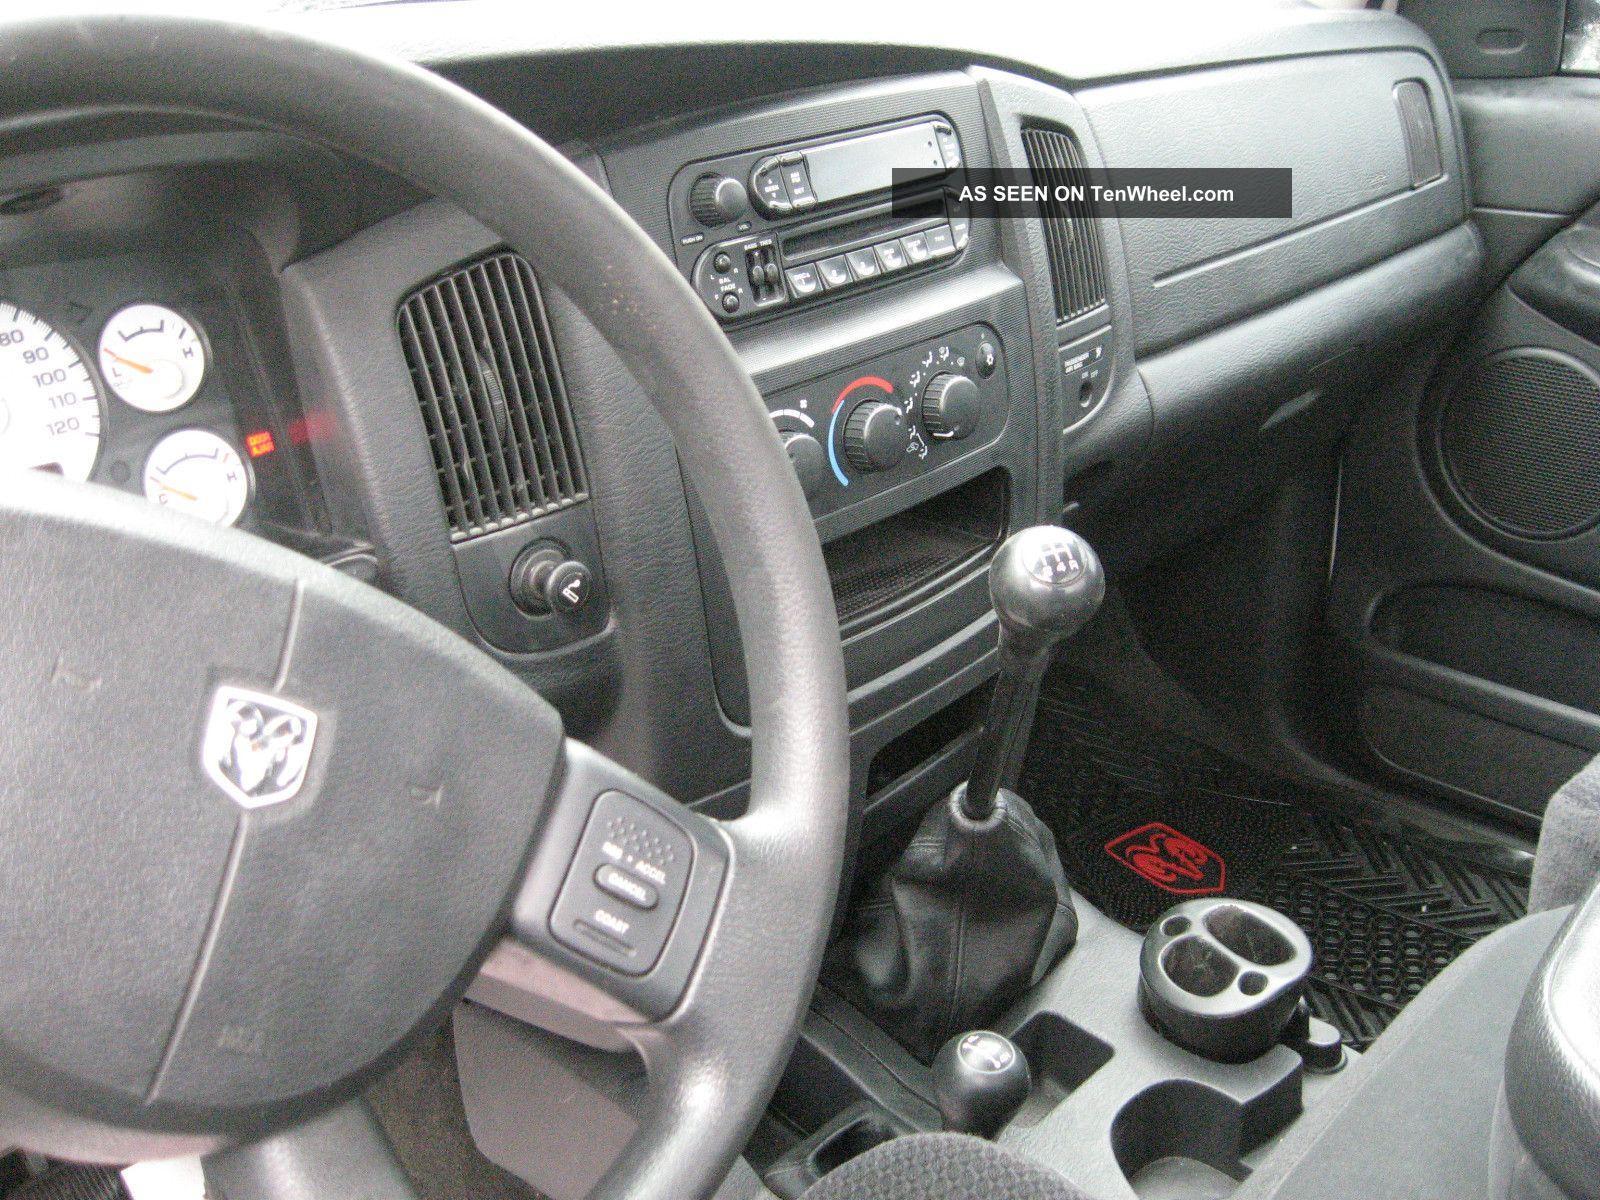 2004 dodge ram slt standard cab 2 door 4 7l 5spd 4x4 - 2004 dodge ram 1500 interior accessories ...